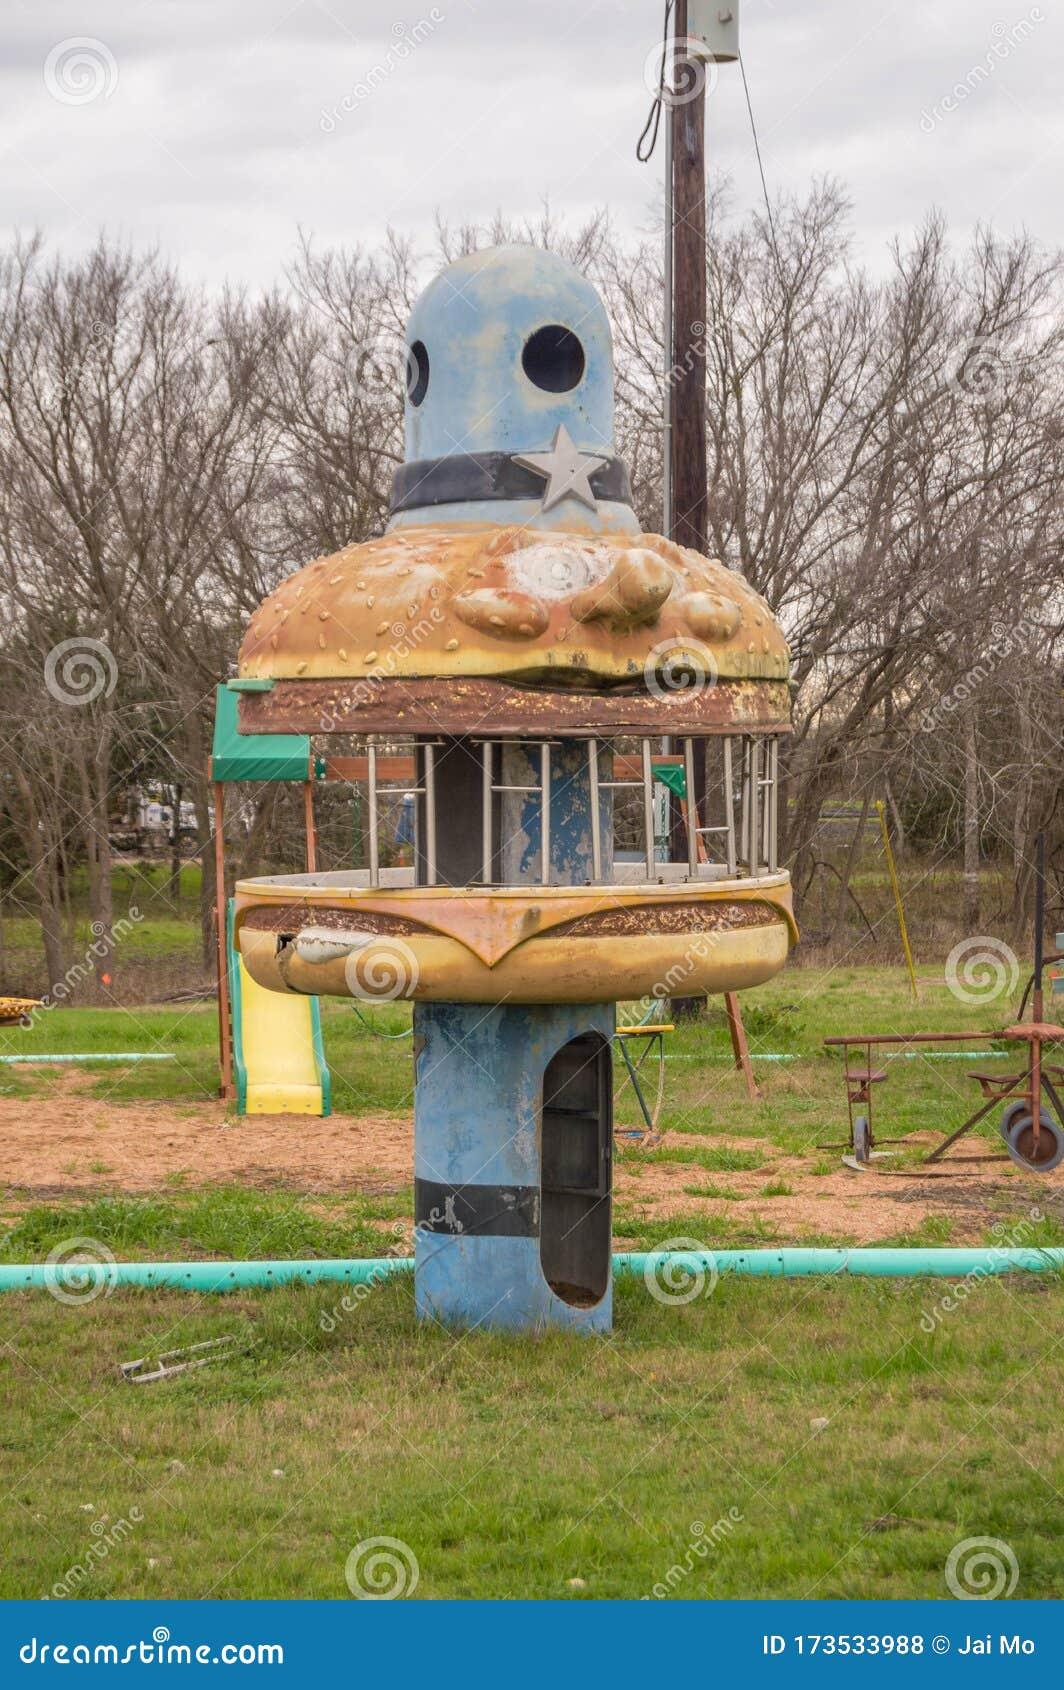 Vintage Retro Kids Playground Hamburger Stock Photo Image Of Shape Equipment 173533988